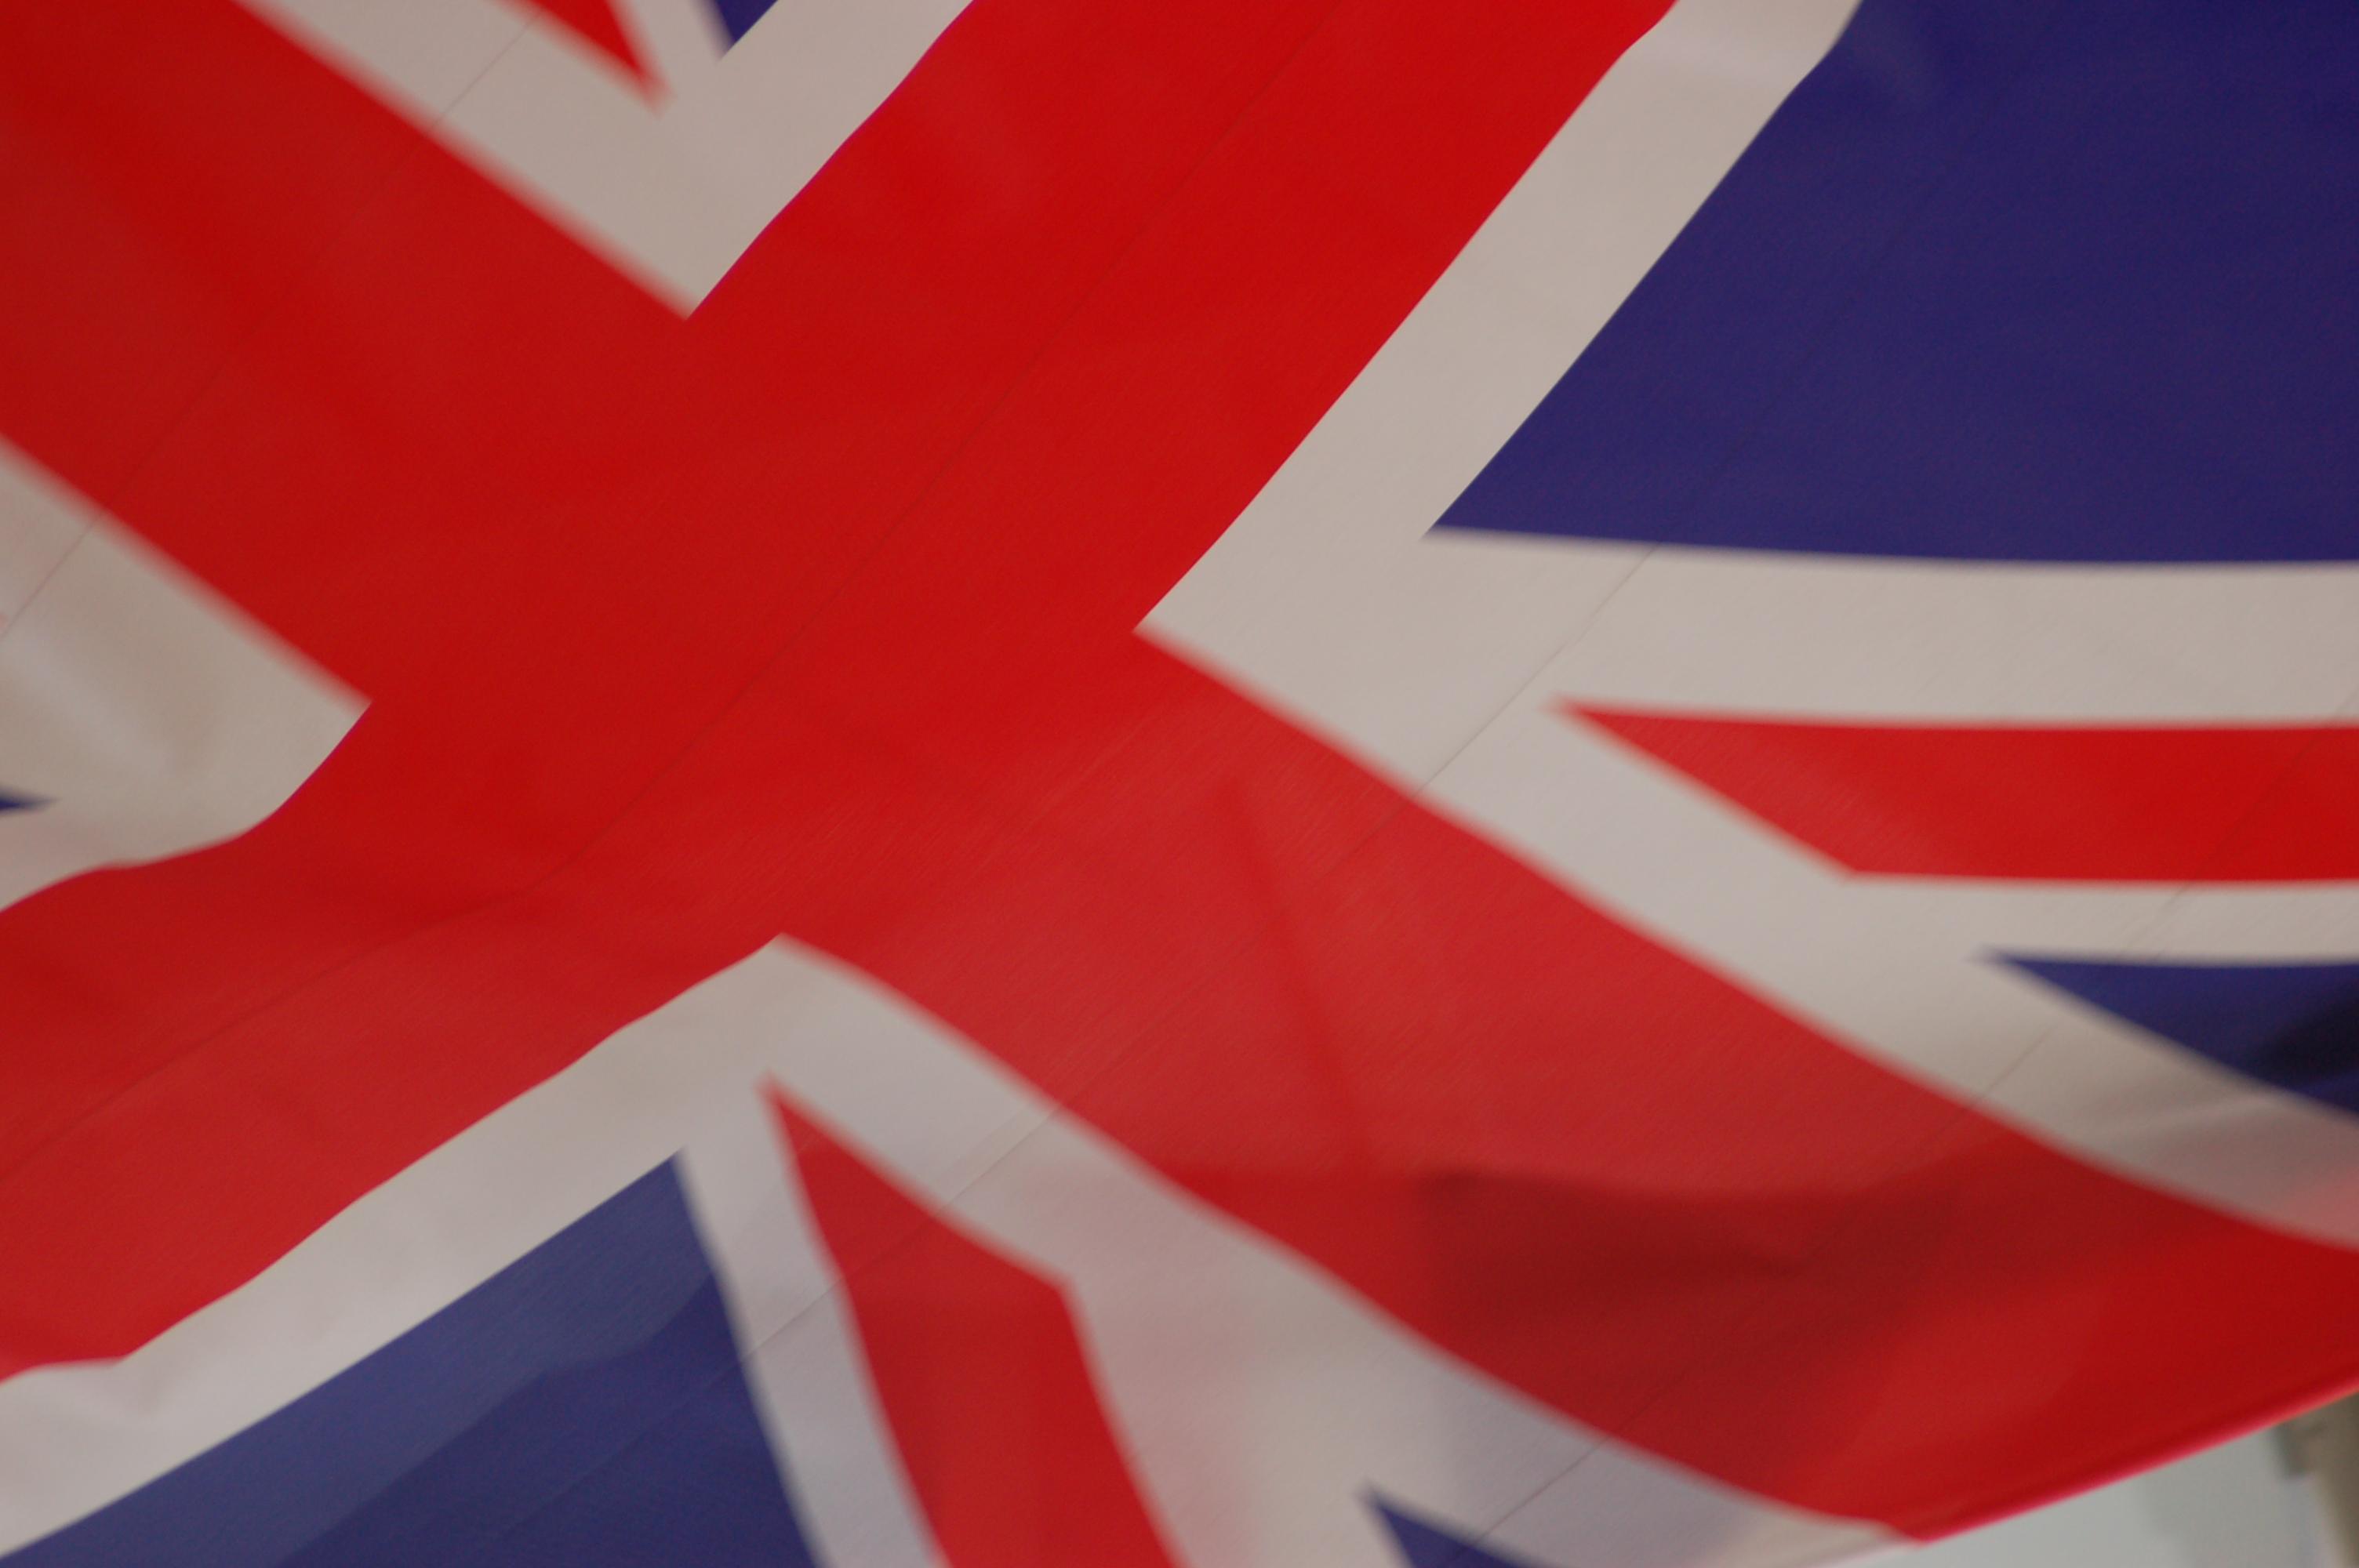 British chipmaker ARM gets nod from Microsoft